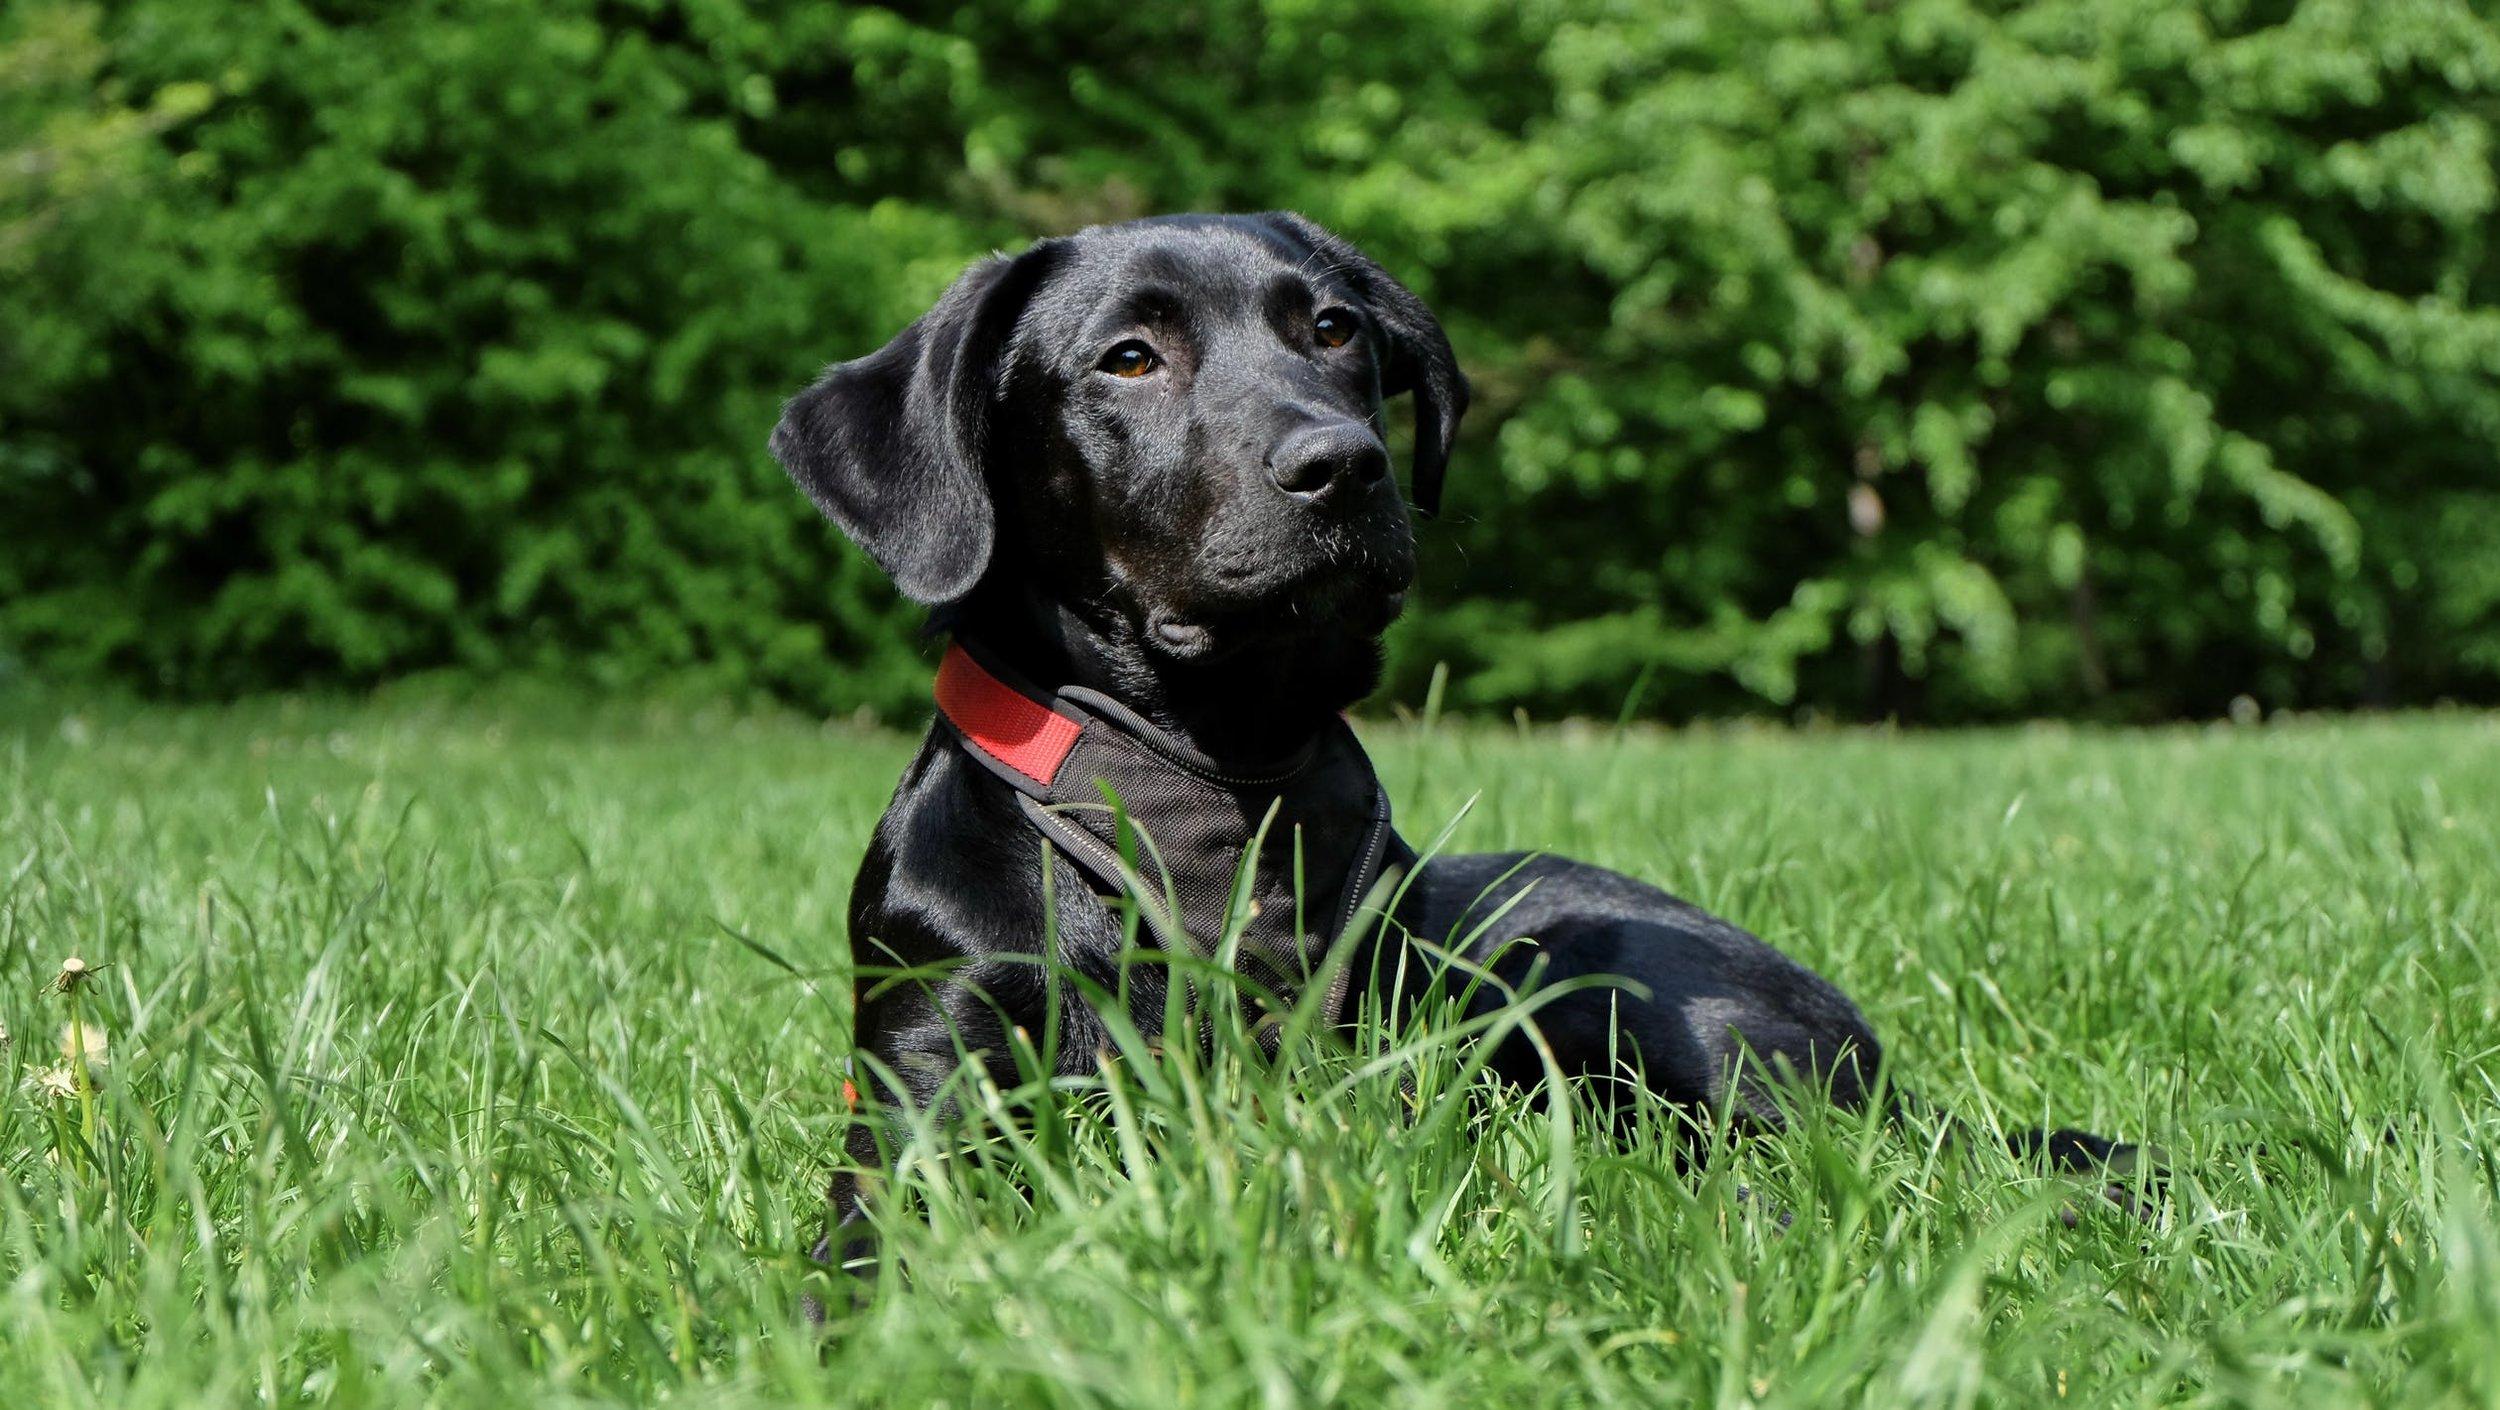 dog-black-labrador-black-dog-162149.jpg